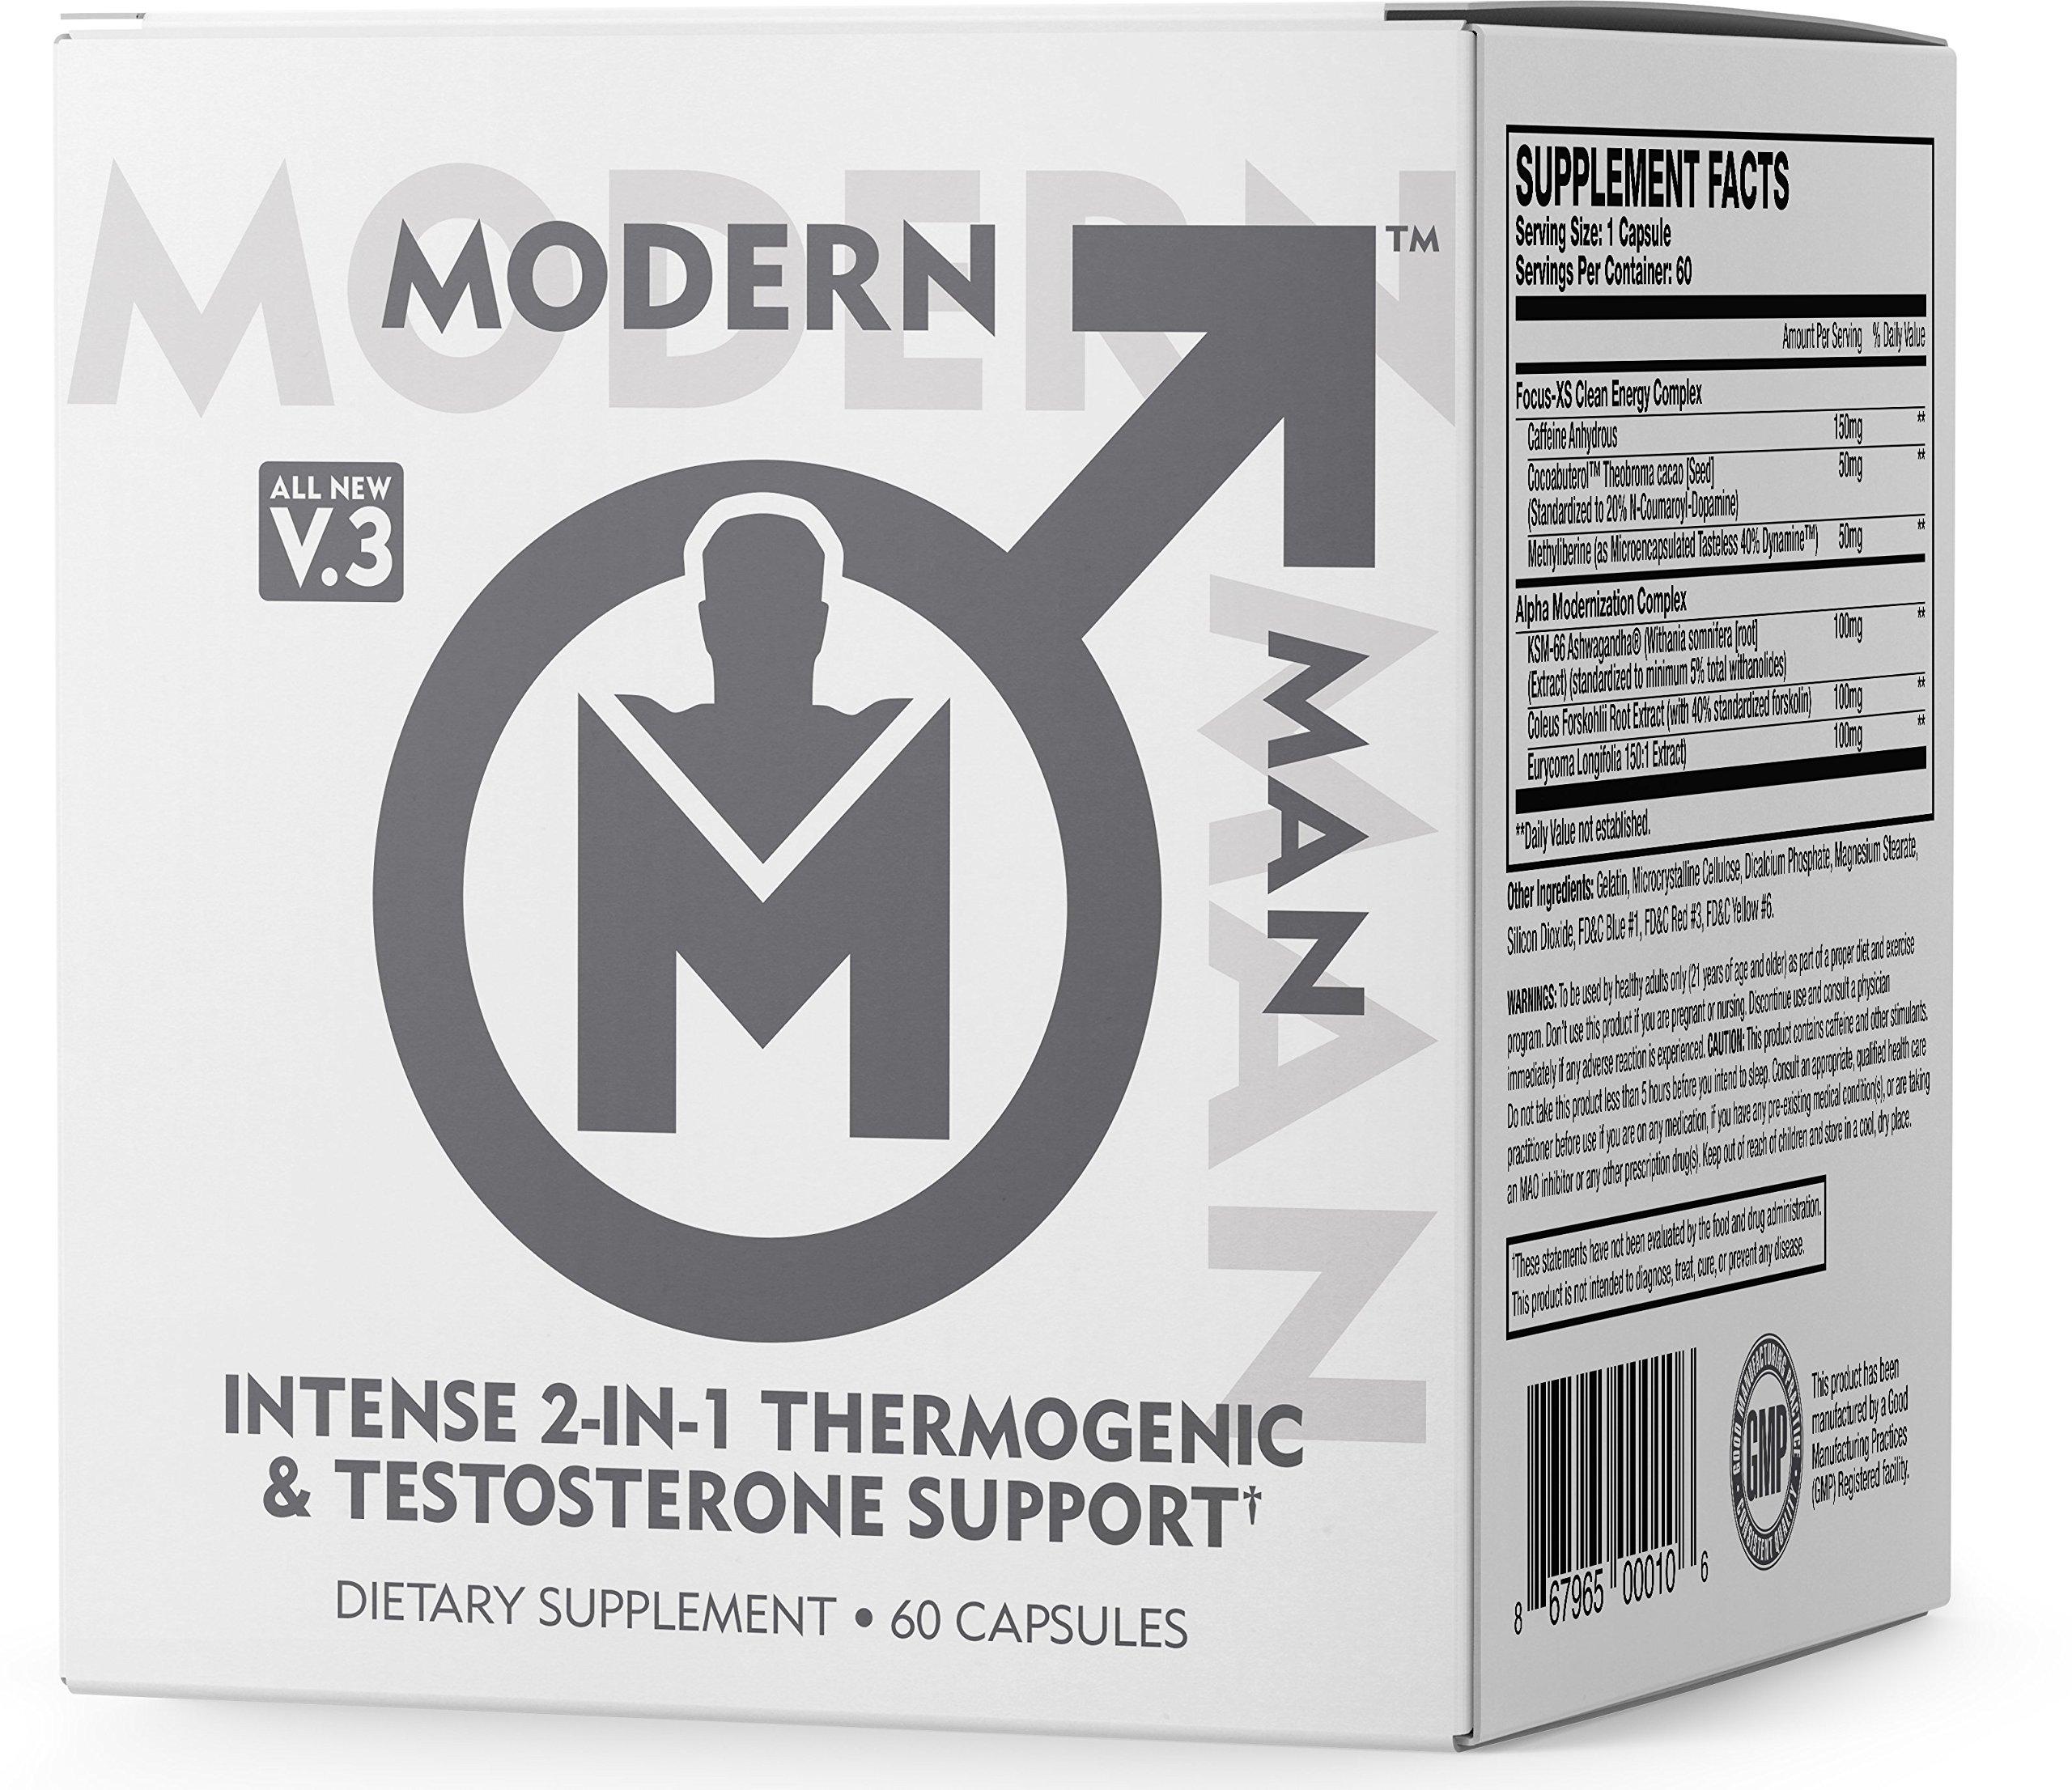 Modern Man Testosterone Thermogenic Supplement